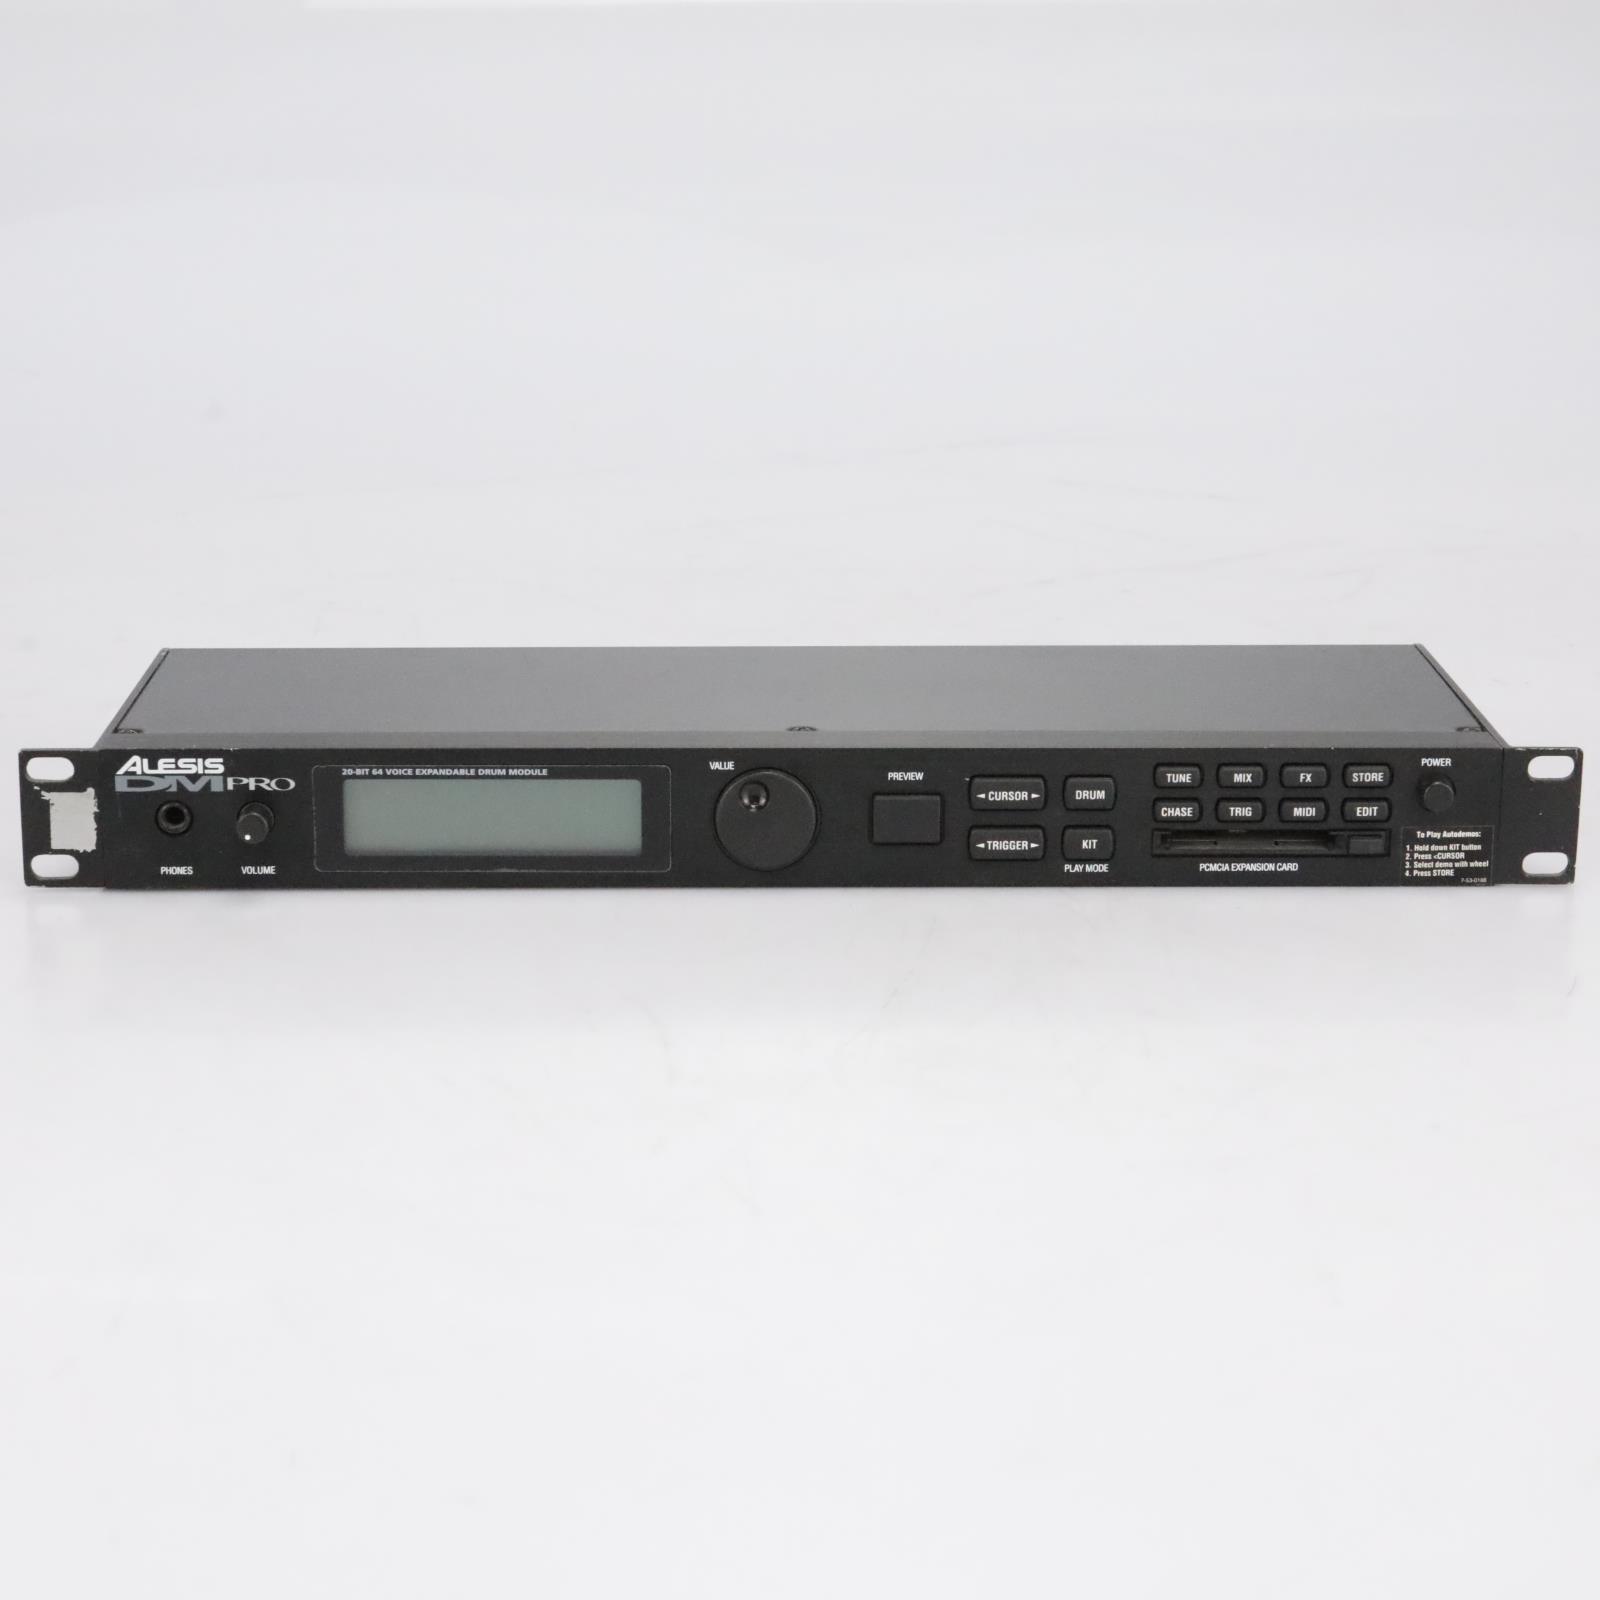 Alesis DM PRO Drum Machine Rack #41637